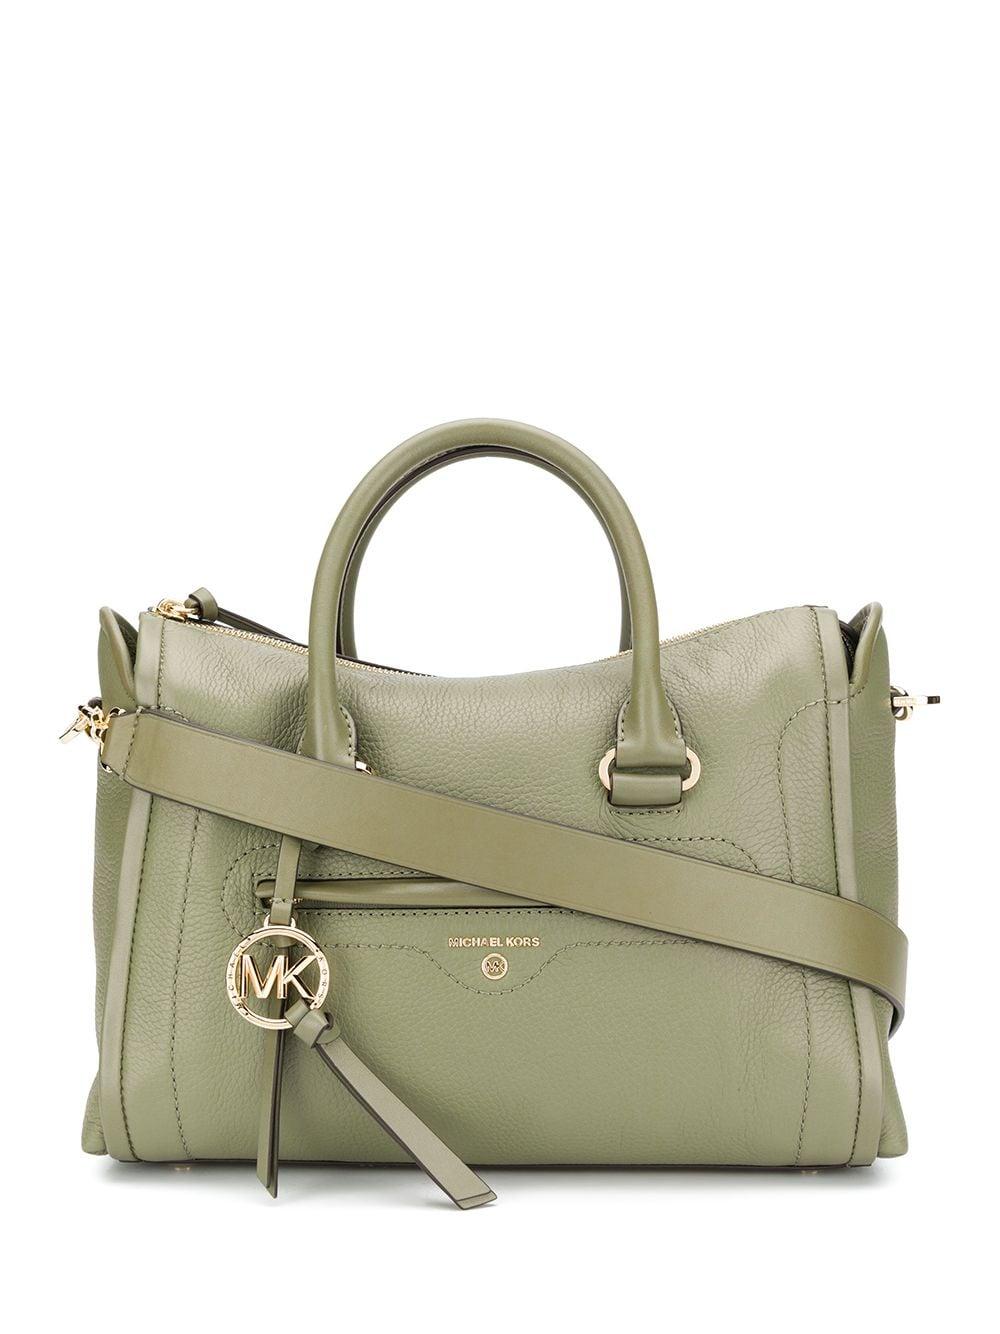 Carine Leather Bag